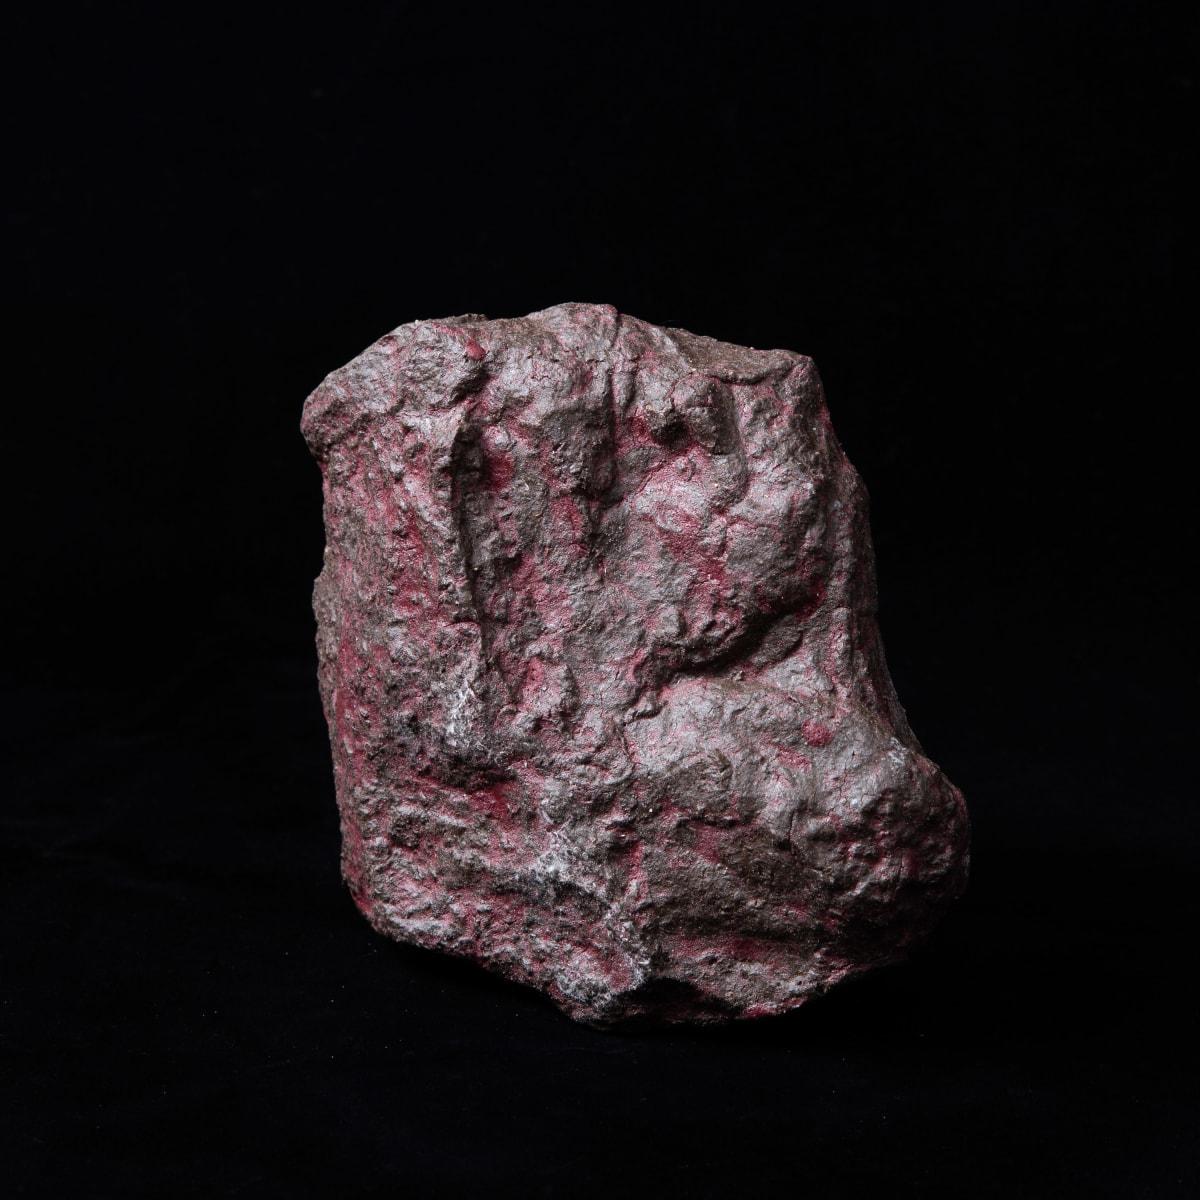 Meekyoung Shin Megalith MS11, 2019 Glazed stoneware 16 x 9 x 14.5 cm 6 1/4 x 3 1/2 x 5 3/4 in